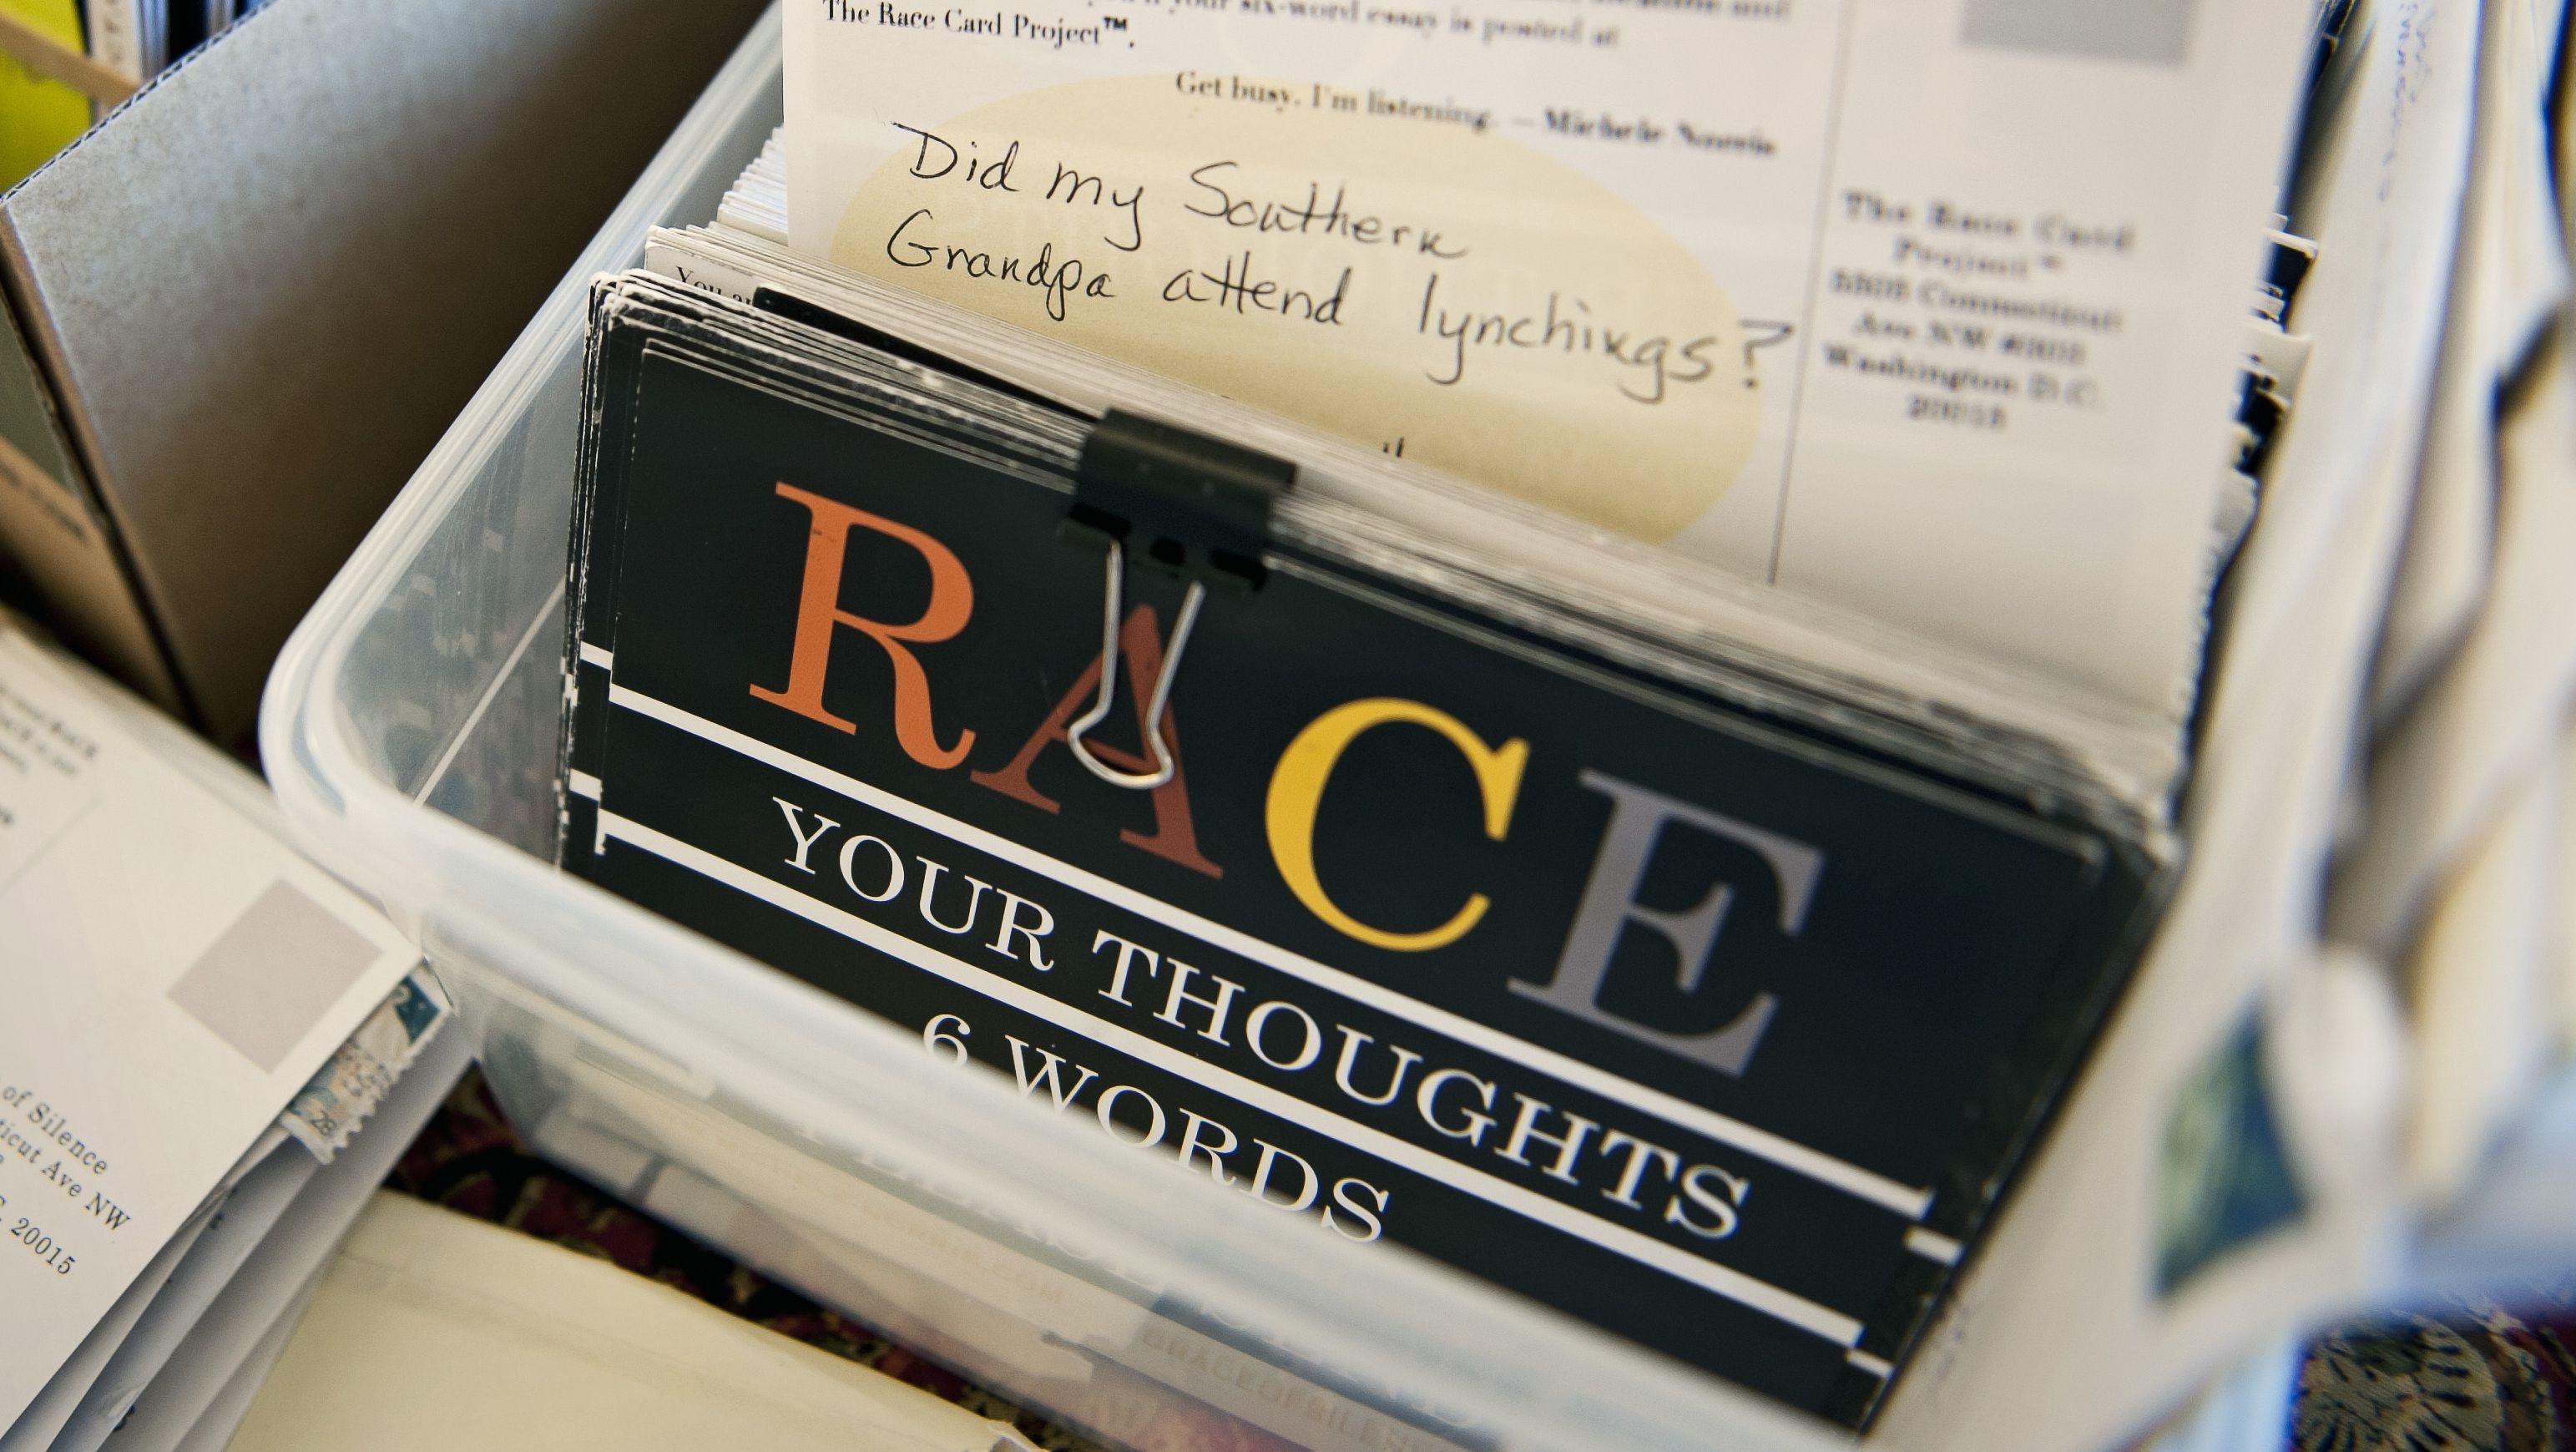 The Race Card Project Six Word Essay Classroom Writing Teaching English Teacher High School Huckleberry Finn Paraphrase